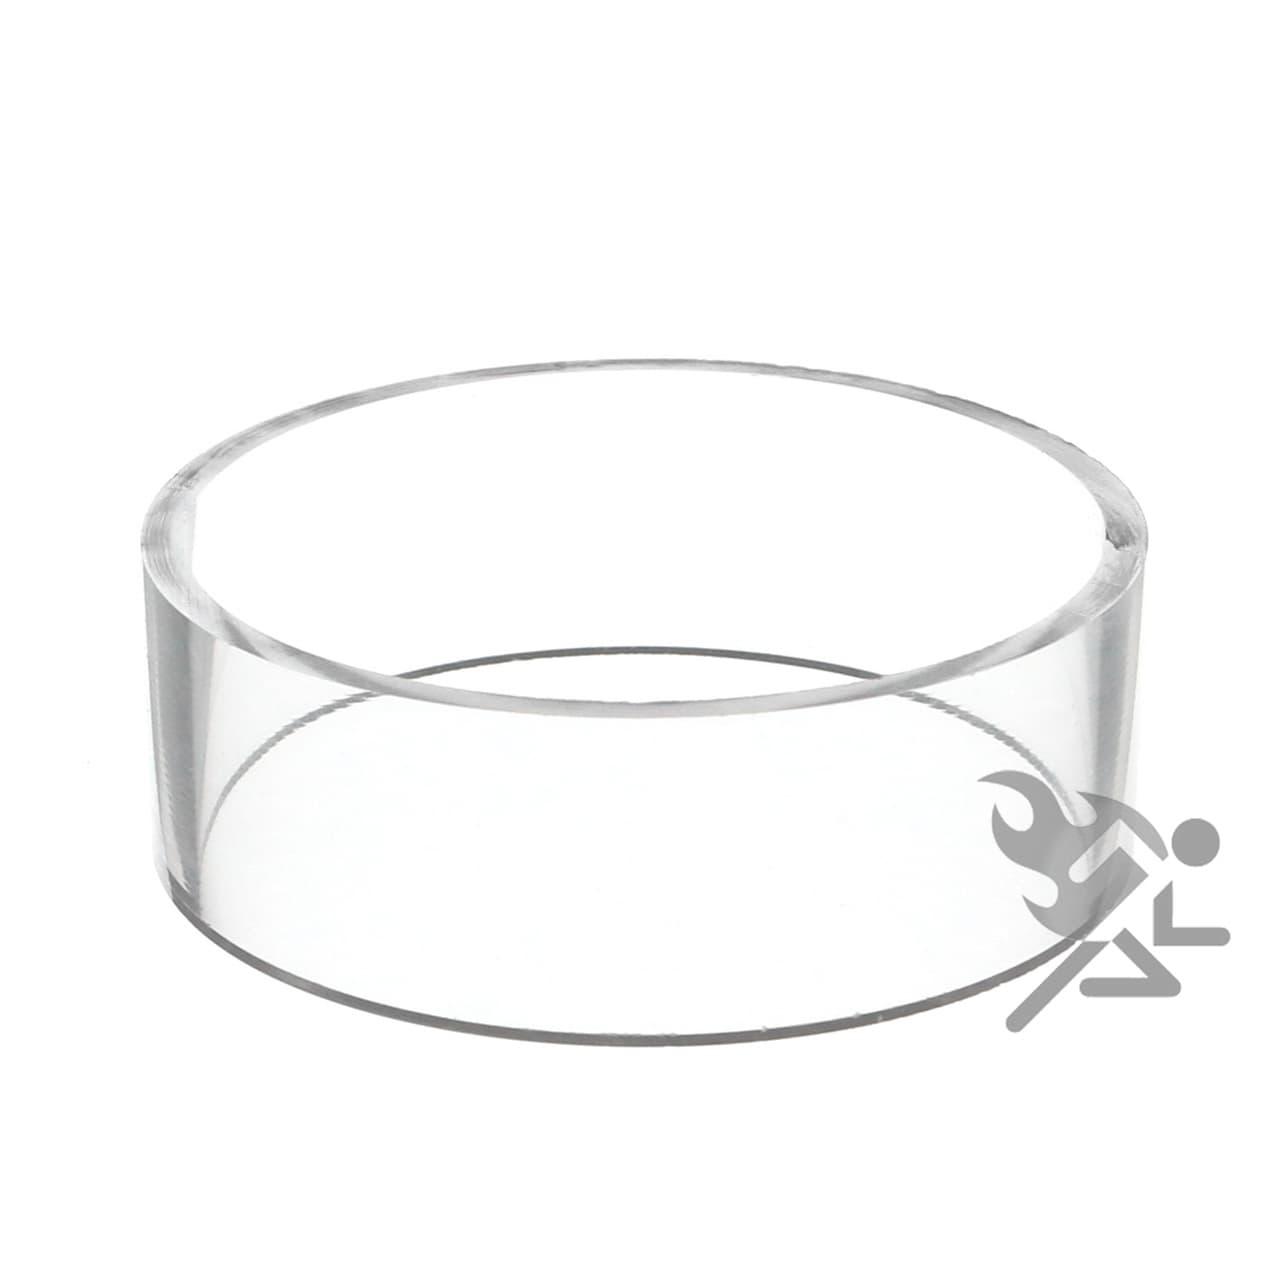 Acrylic Ring, 3″dia x 1″h